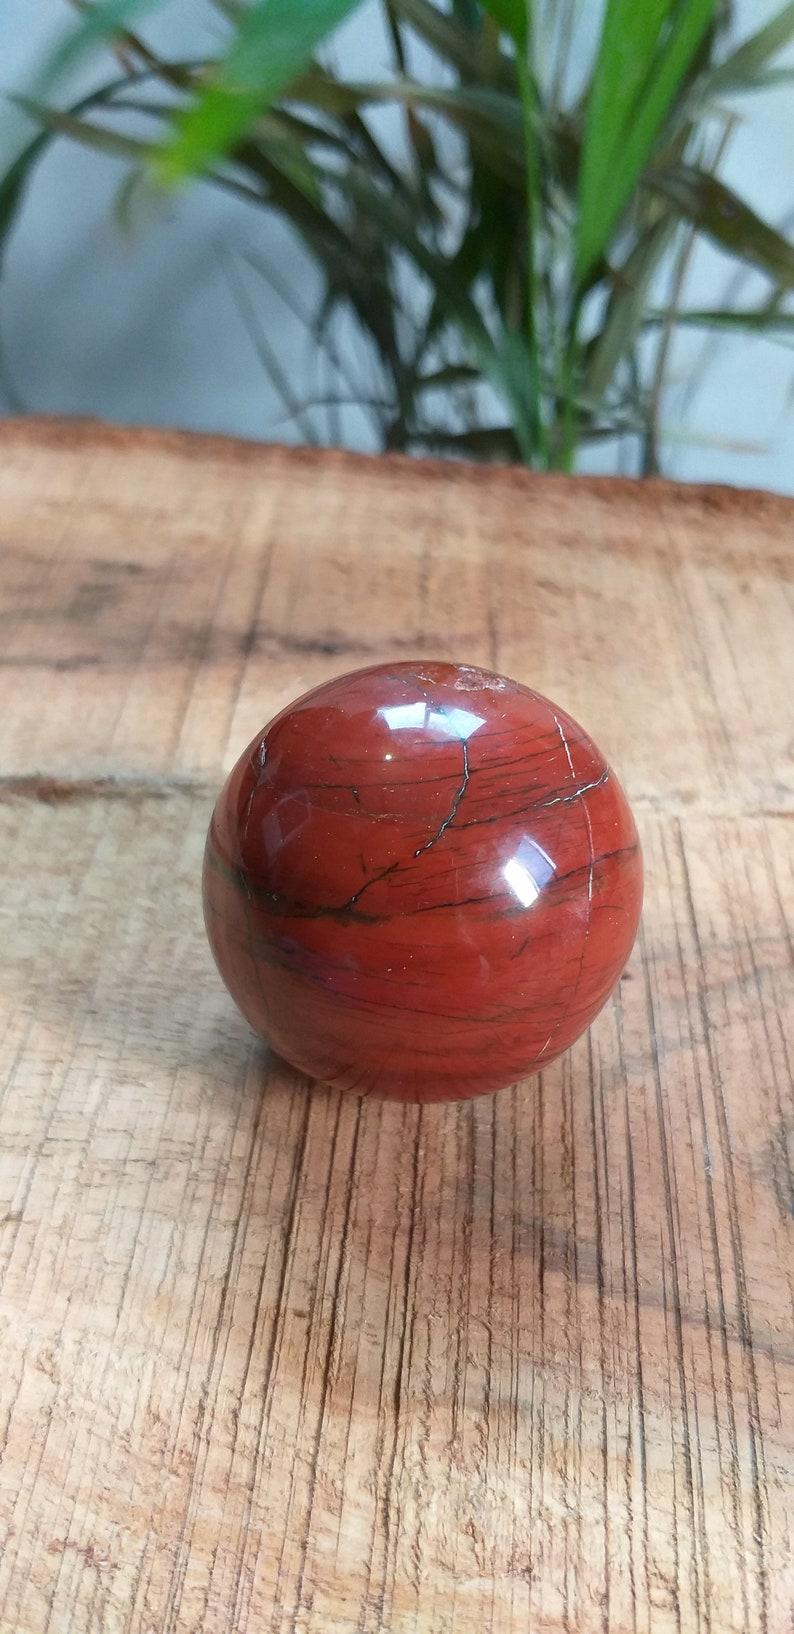 42 MM Natural Beautiful Red Jasper Sphere Gemstone Sphere Silversmith Specimen Red Jasper Healing Crystal  Jasper Sphere Home Decor Sphere